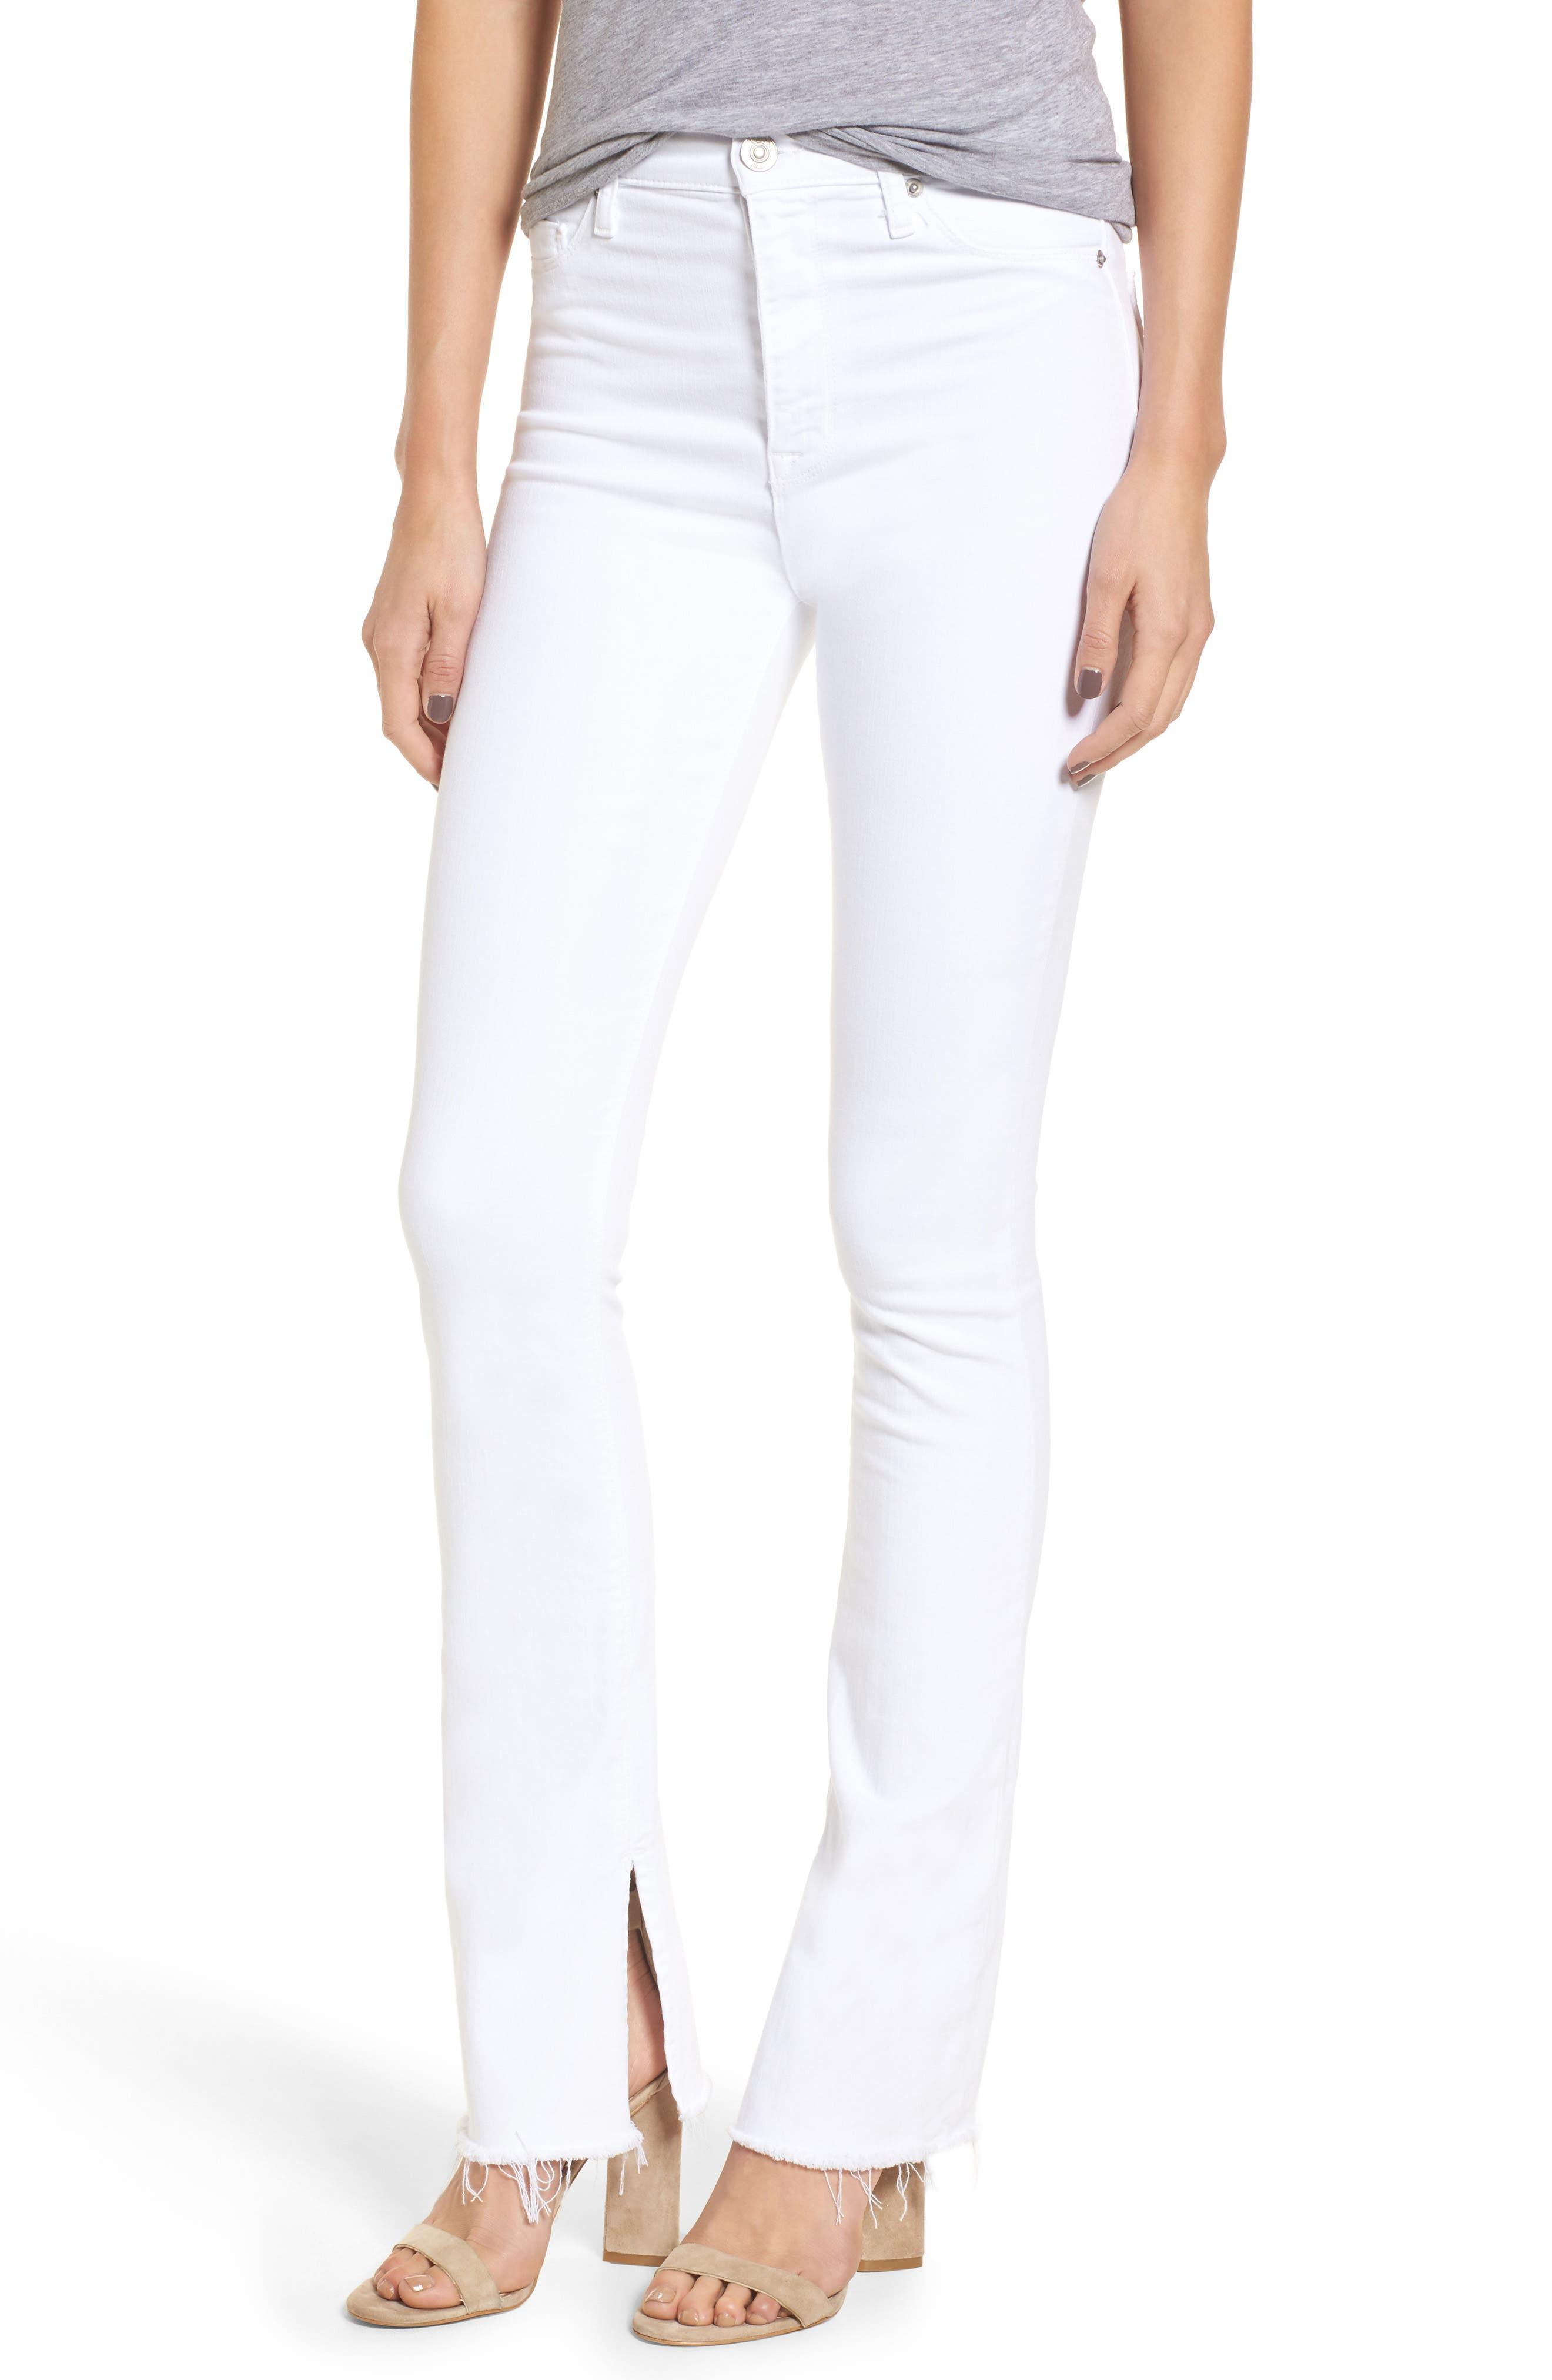 Main Image - Hudson Jeans Heartbreaker High Waist Bootcut Jeans (Optical White)